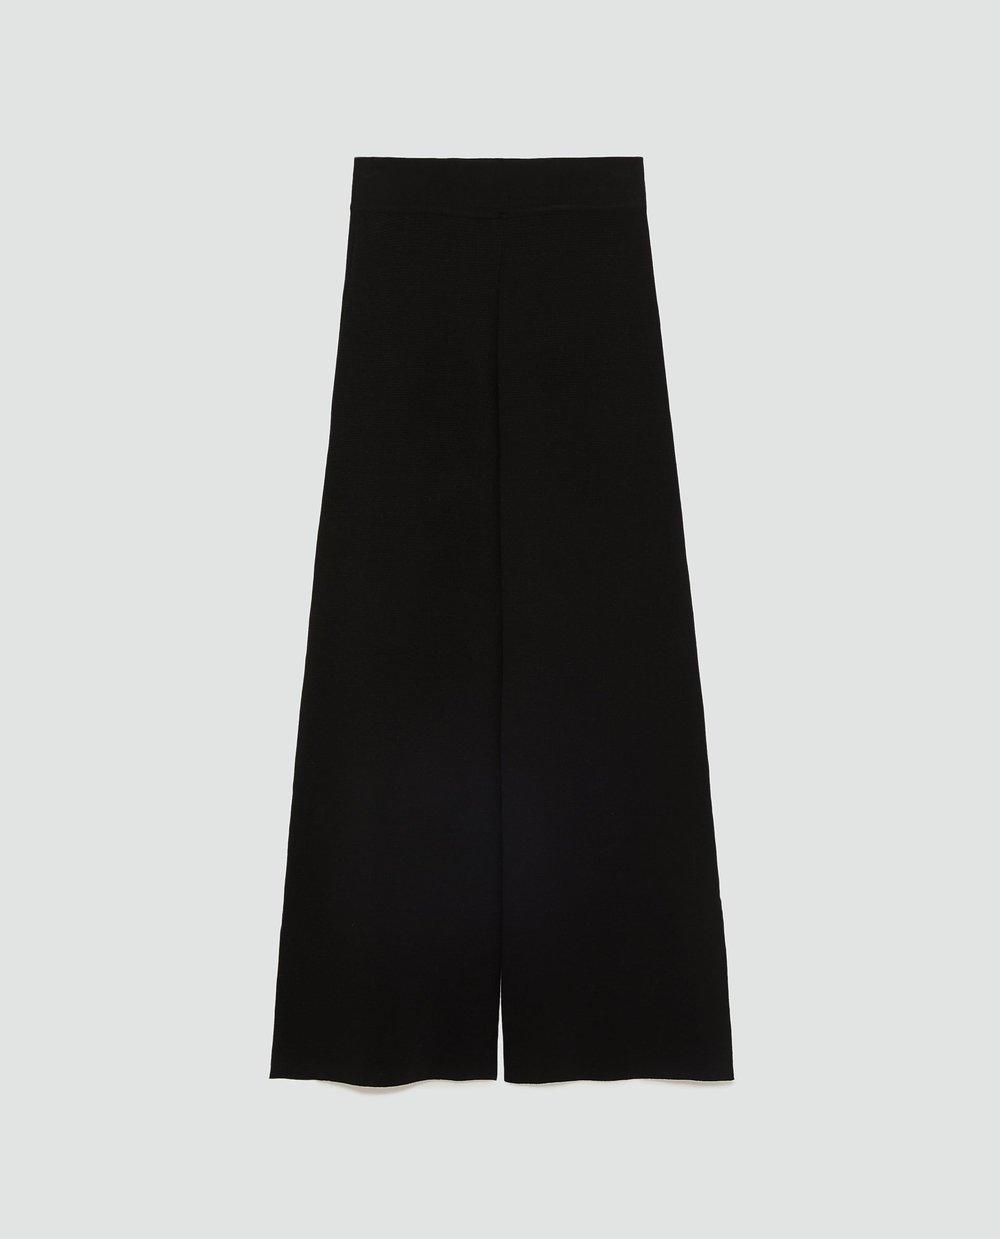 https://www.zara.com/ca/en/palazzo-pants-p06254012.html?v1=5744009&v2=719015